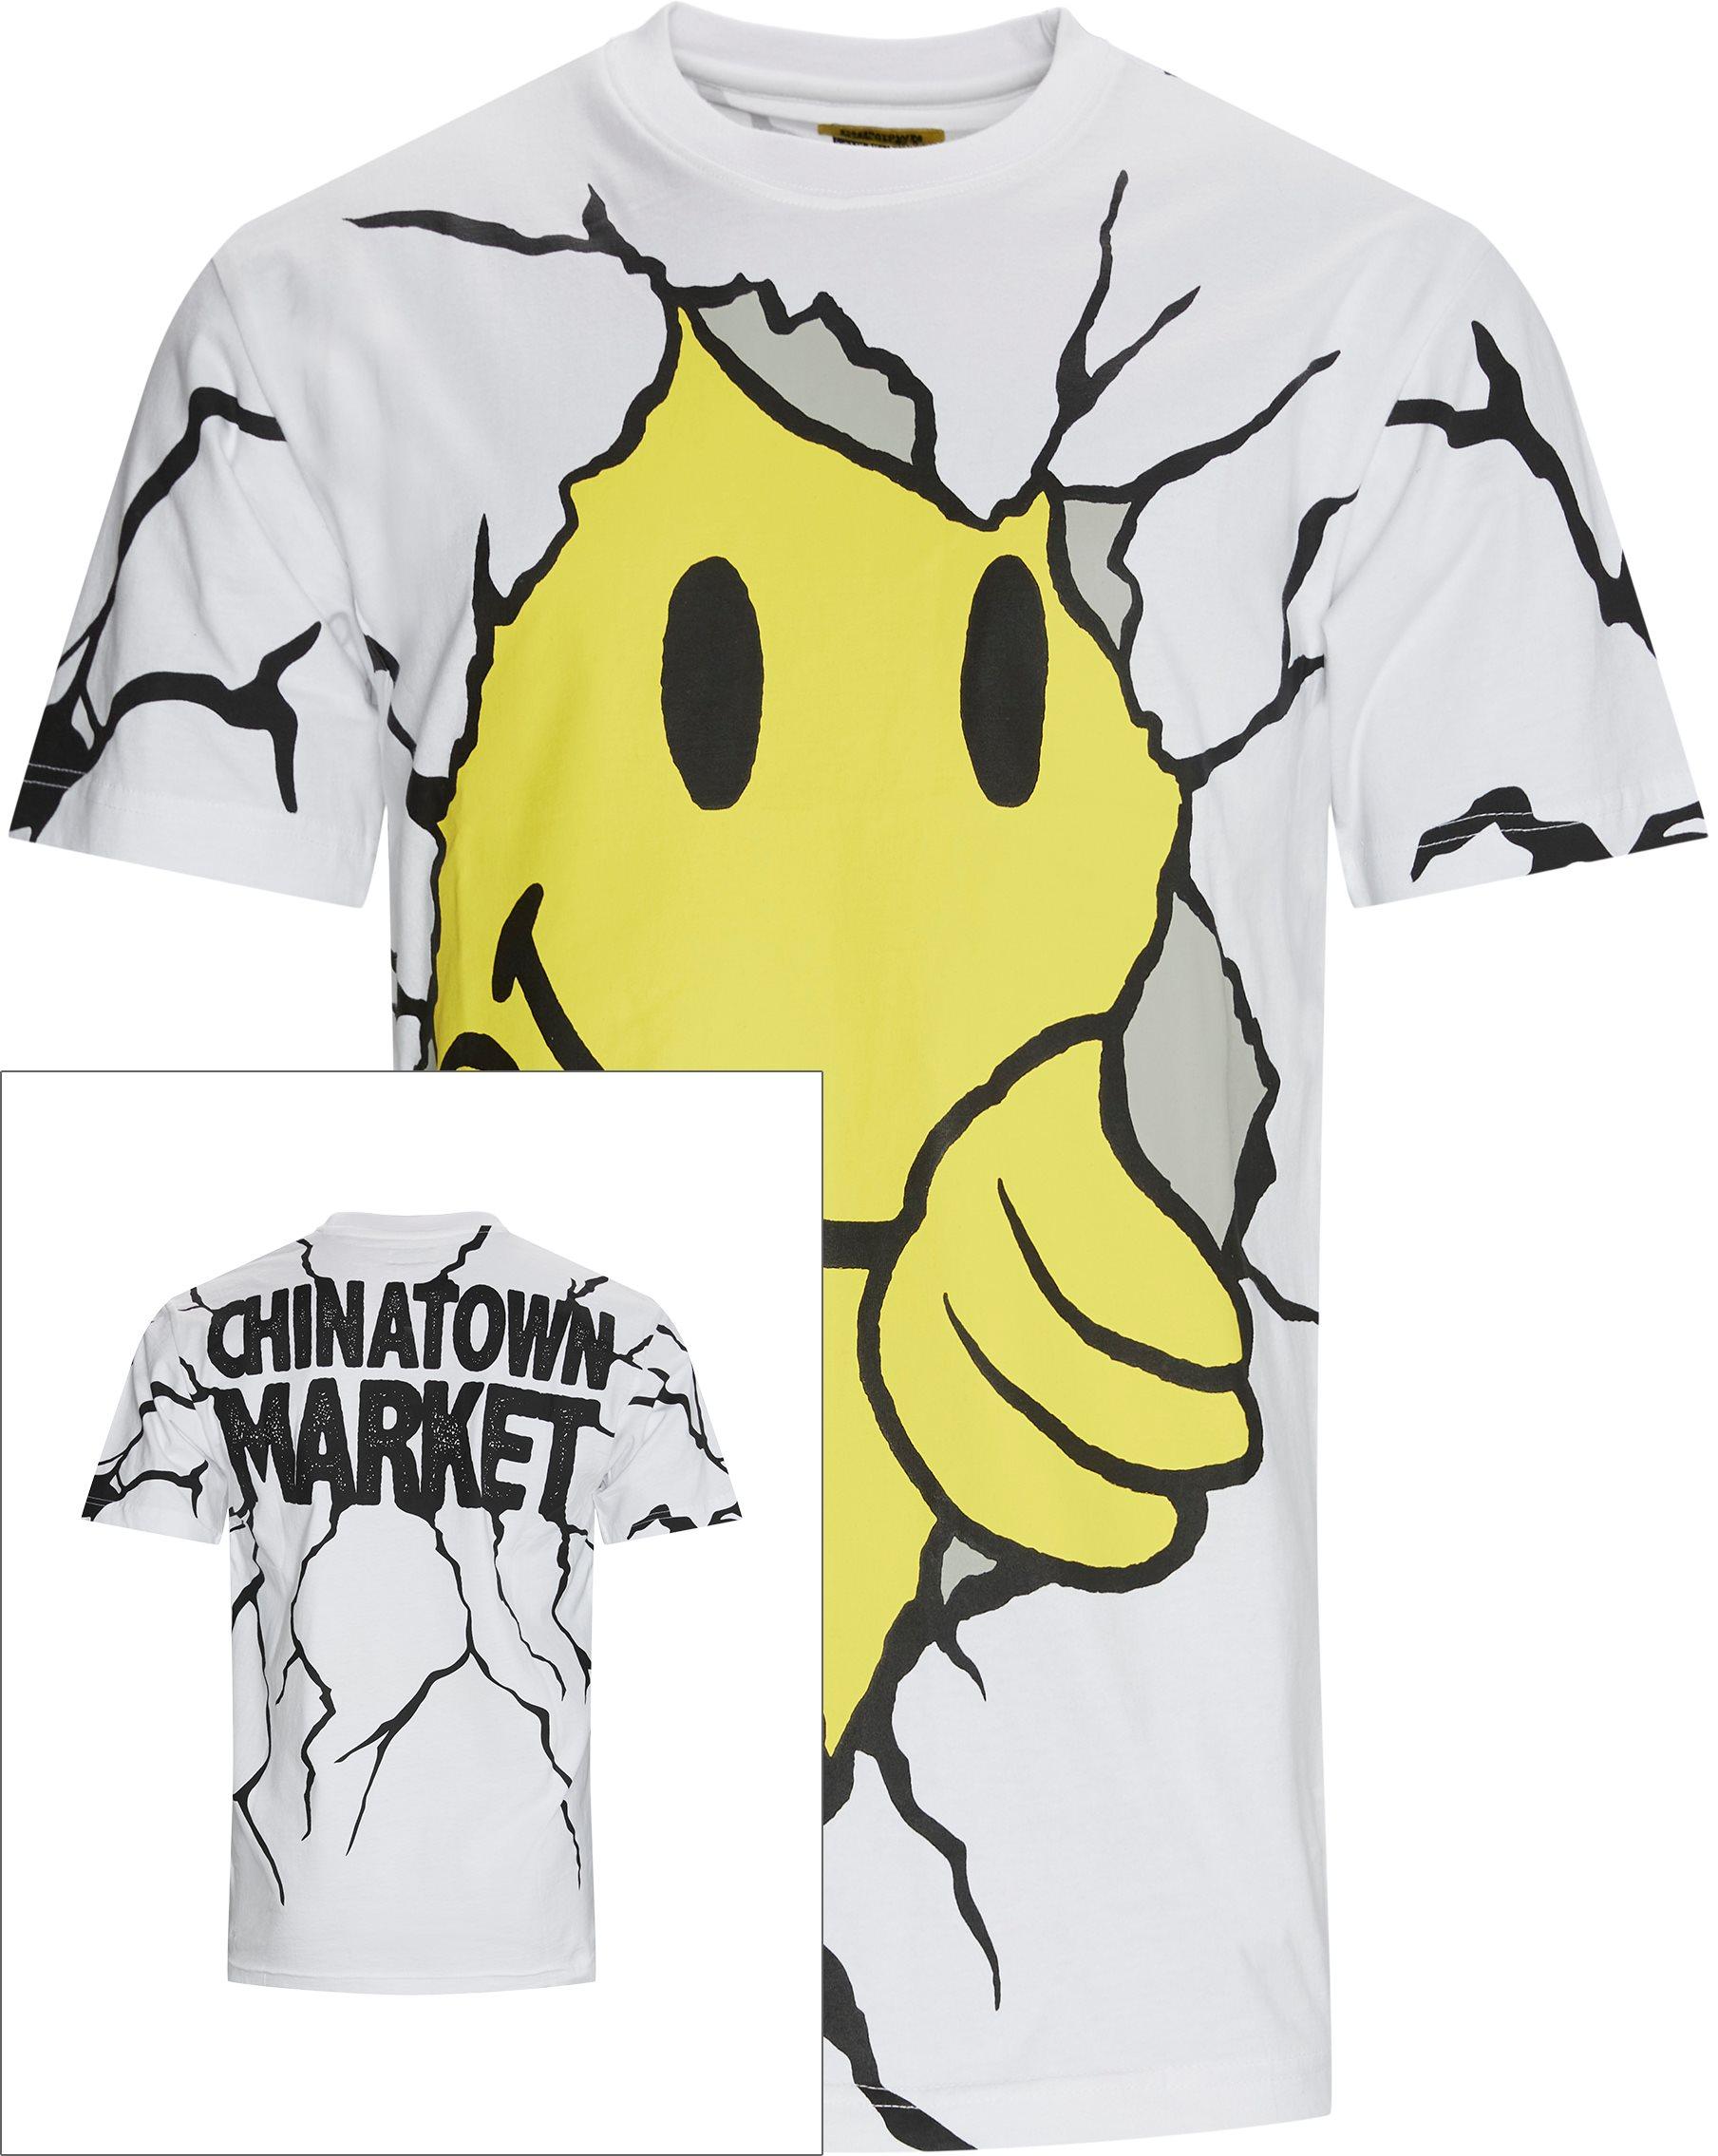 Smiley Dry Wall Breaker Tee - T-shirts - Regular fit - Hvid